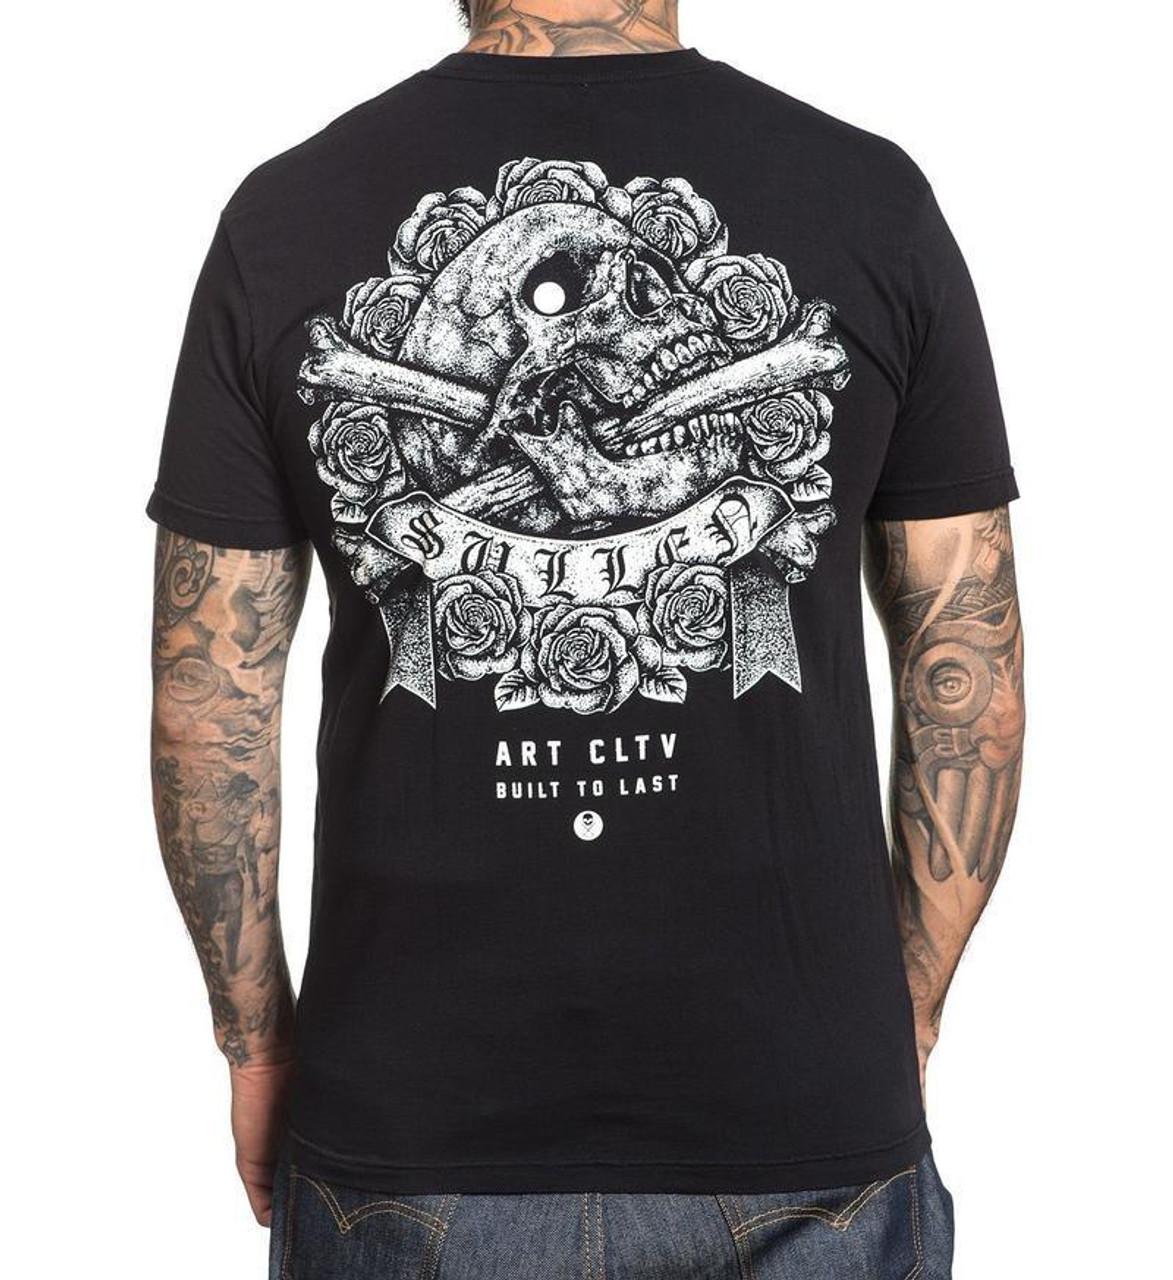 Sullen Art Collective Stipple Skull Tattoo Urban Street Inked Mens Shirt SCM1411